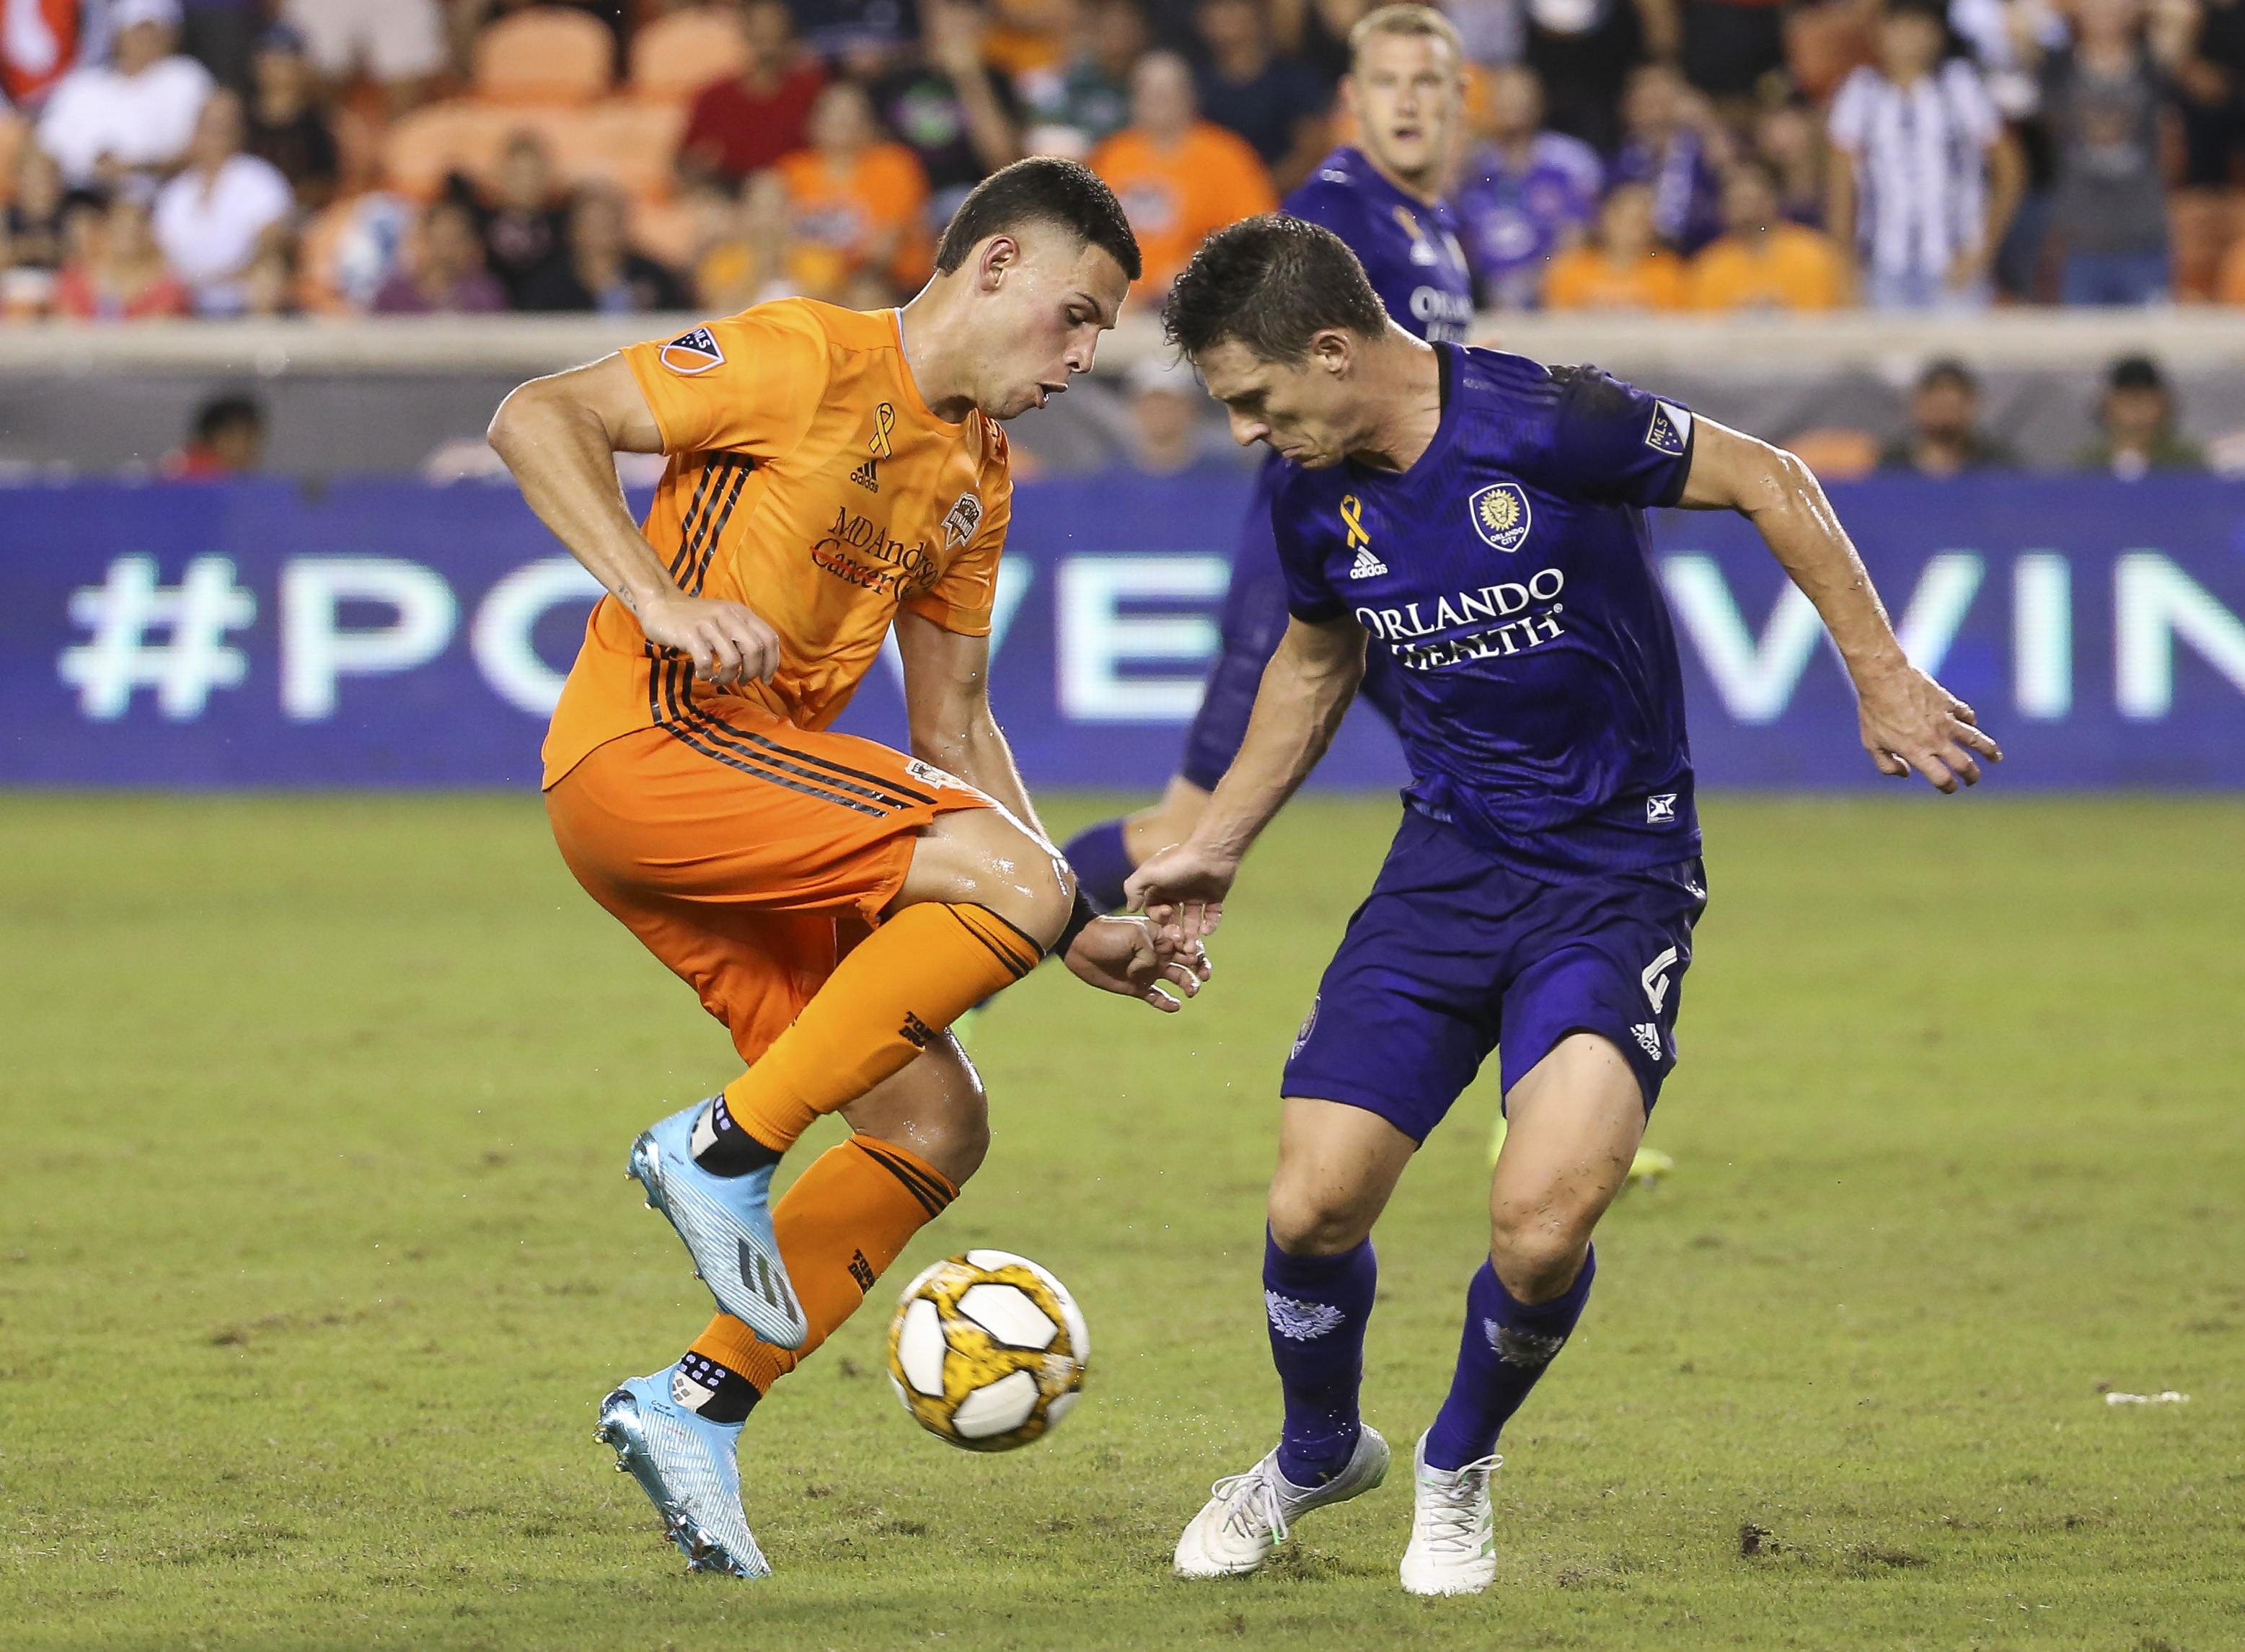 MLS: Orlando City SC at Houston Dynamo